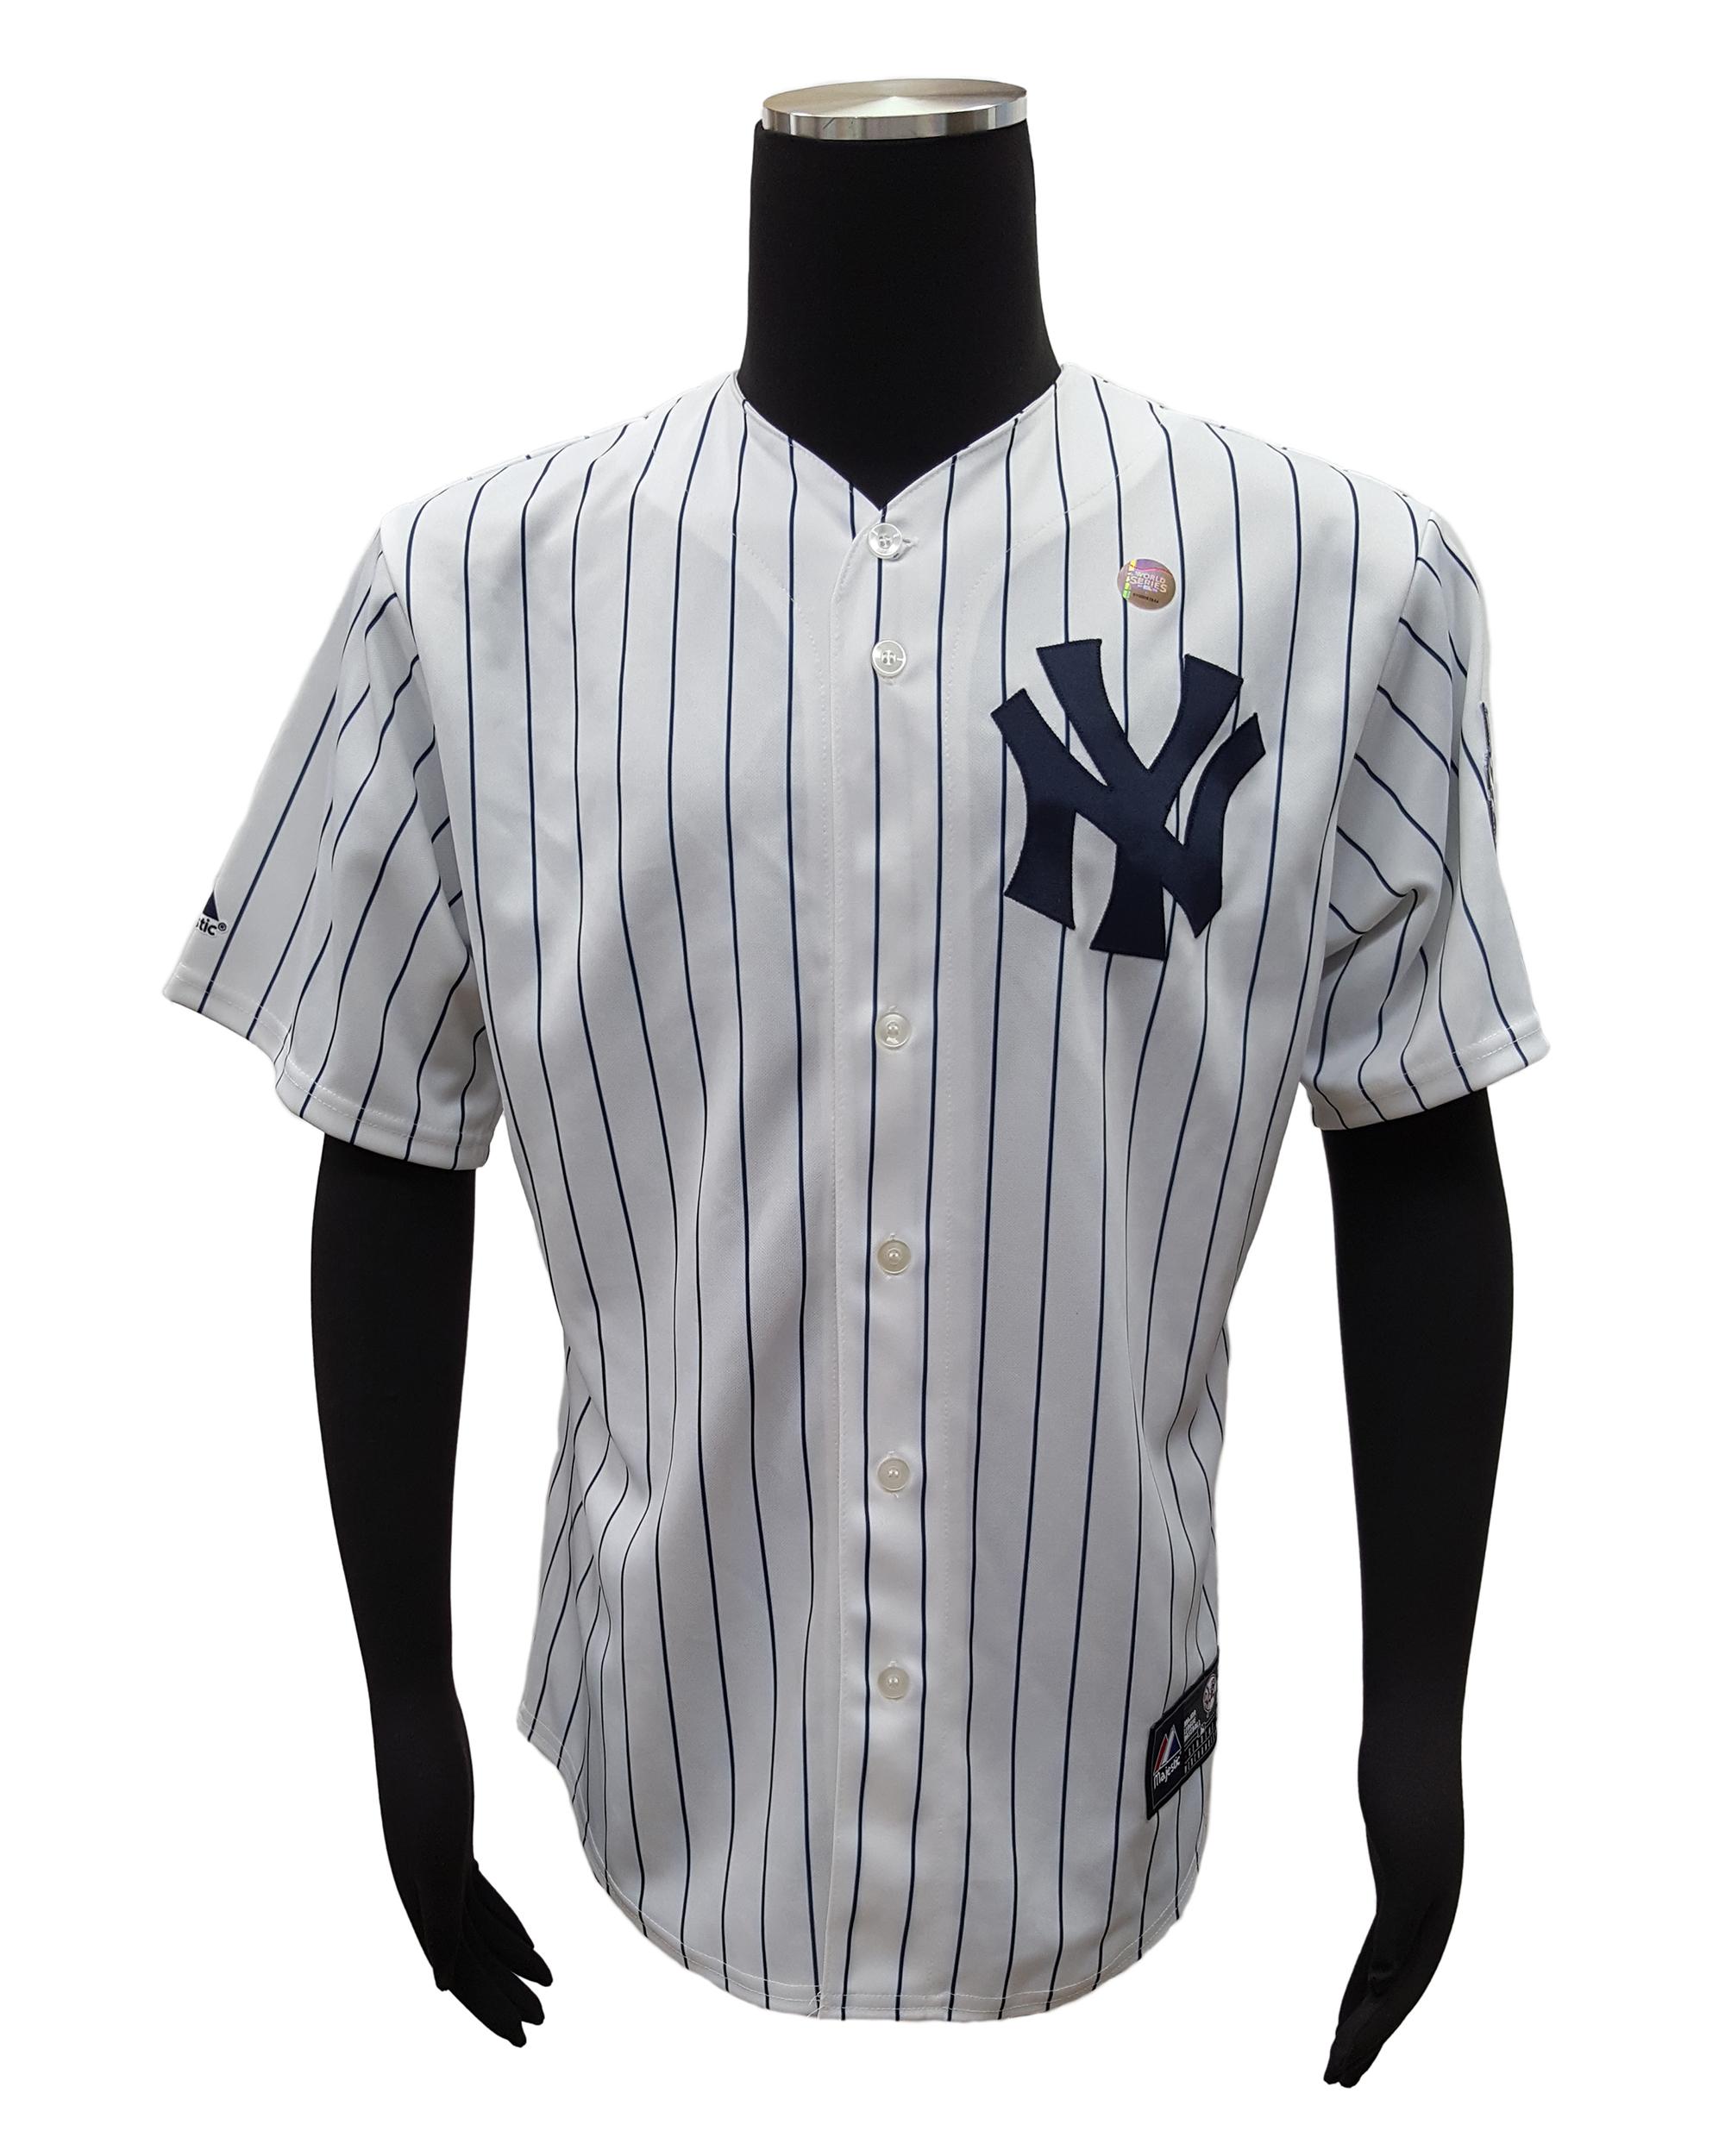 Majestic NY Yankees World Series 2009